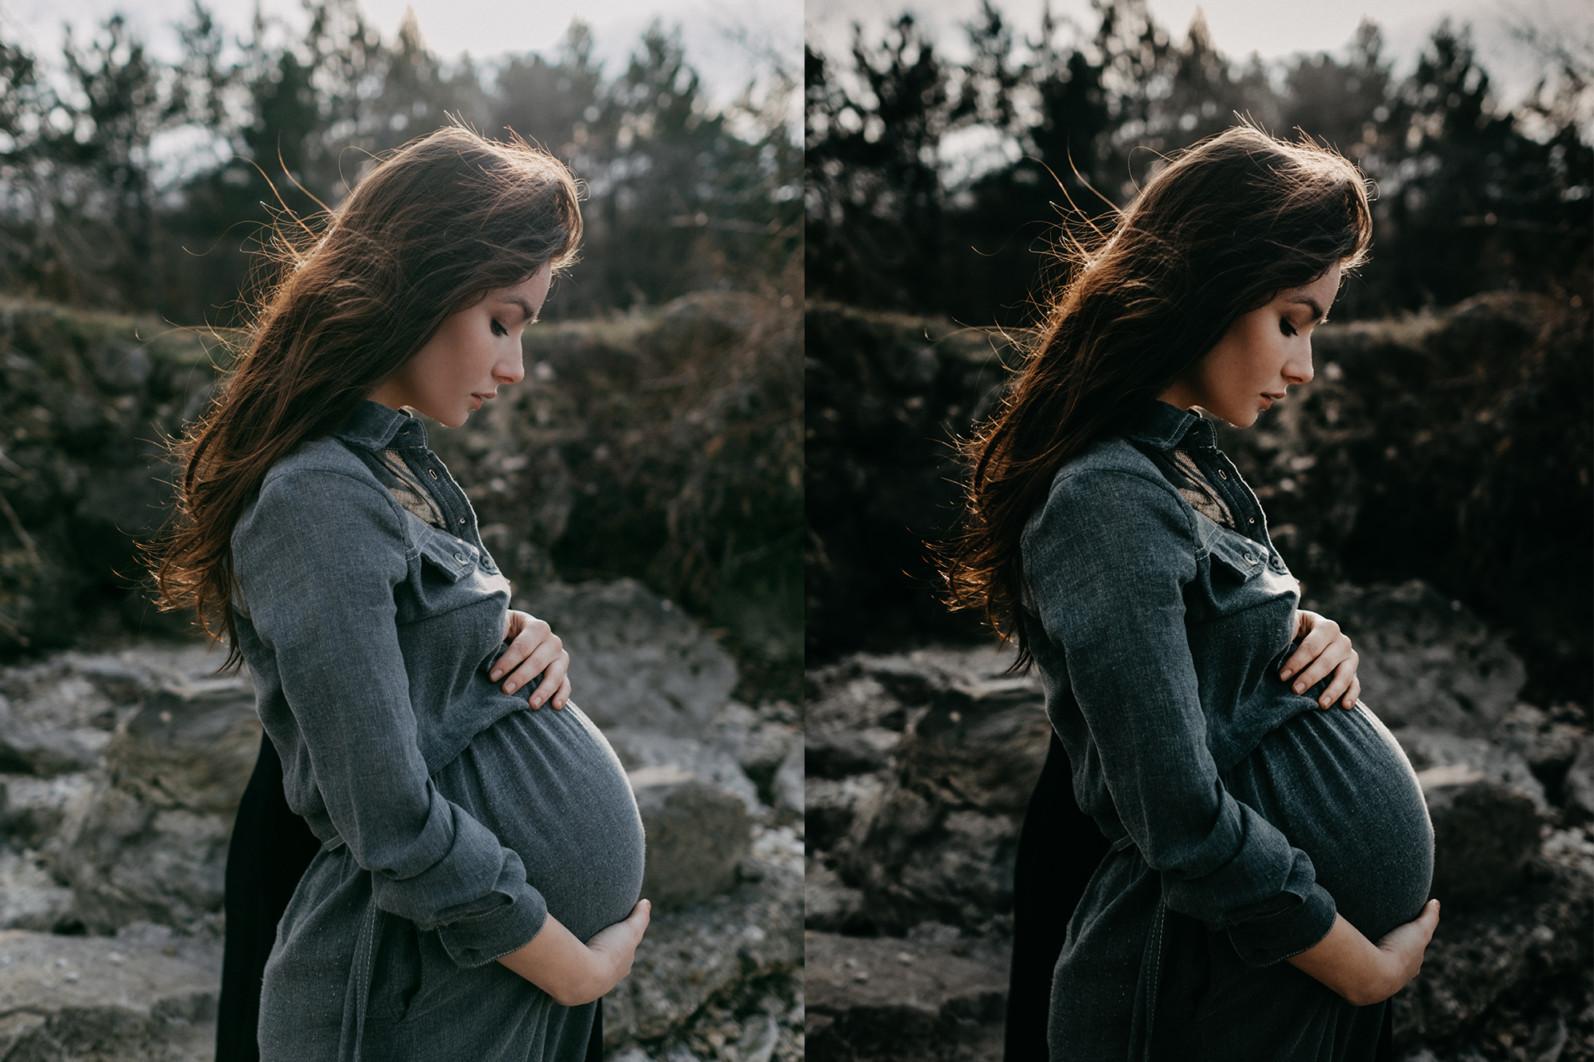 20 x Lightroom Presets, Maternity Presets, Outdoor Presets, Warm Presets, Portrait Presets - 2 Maternity 2 -